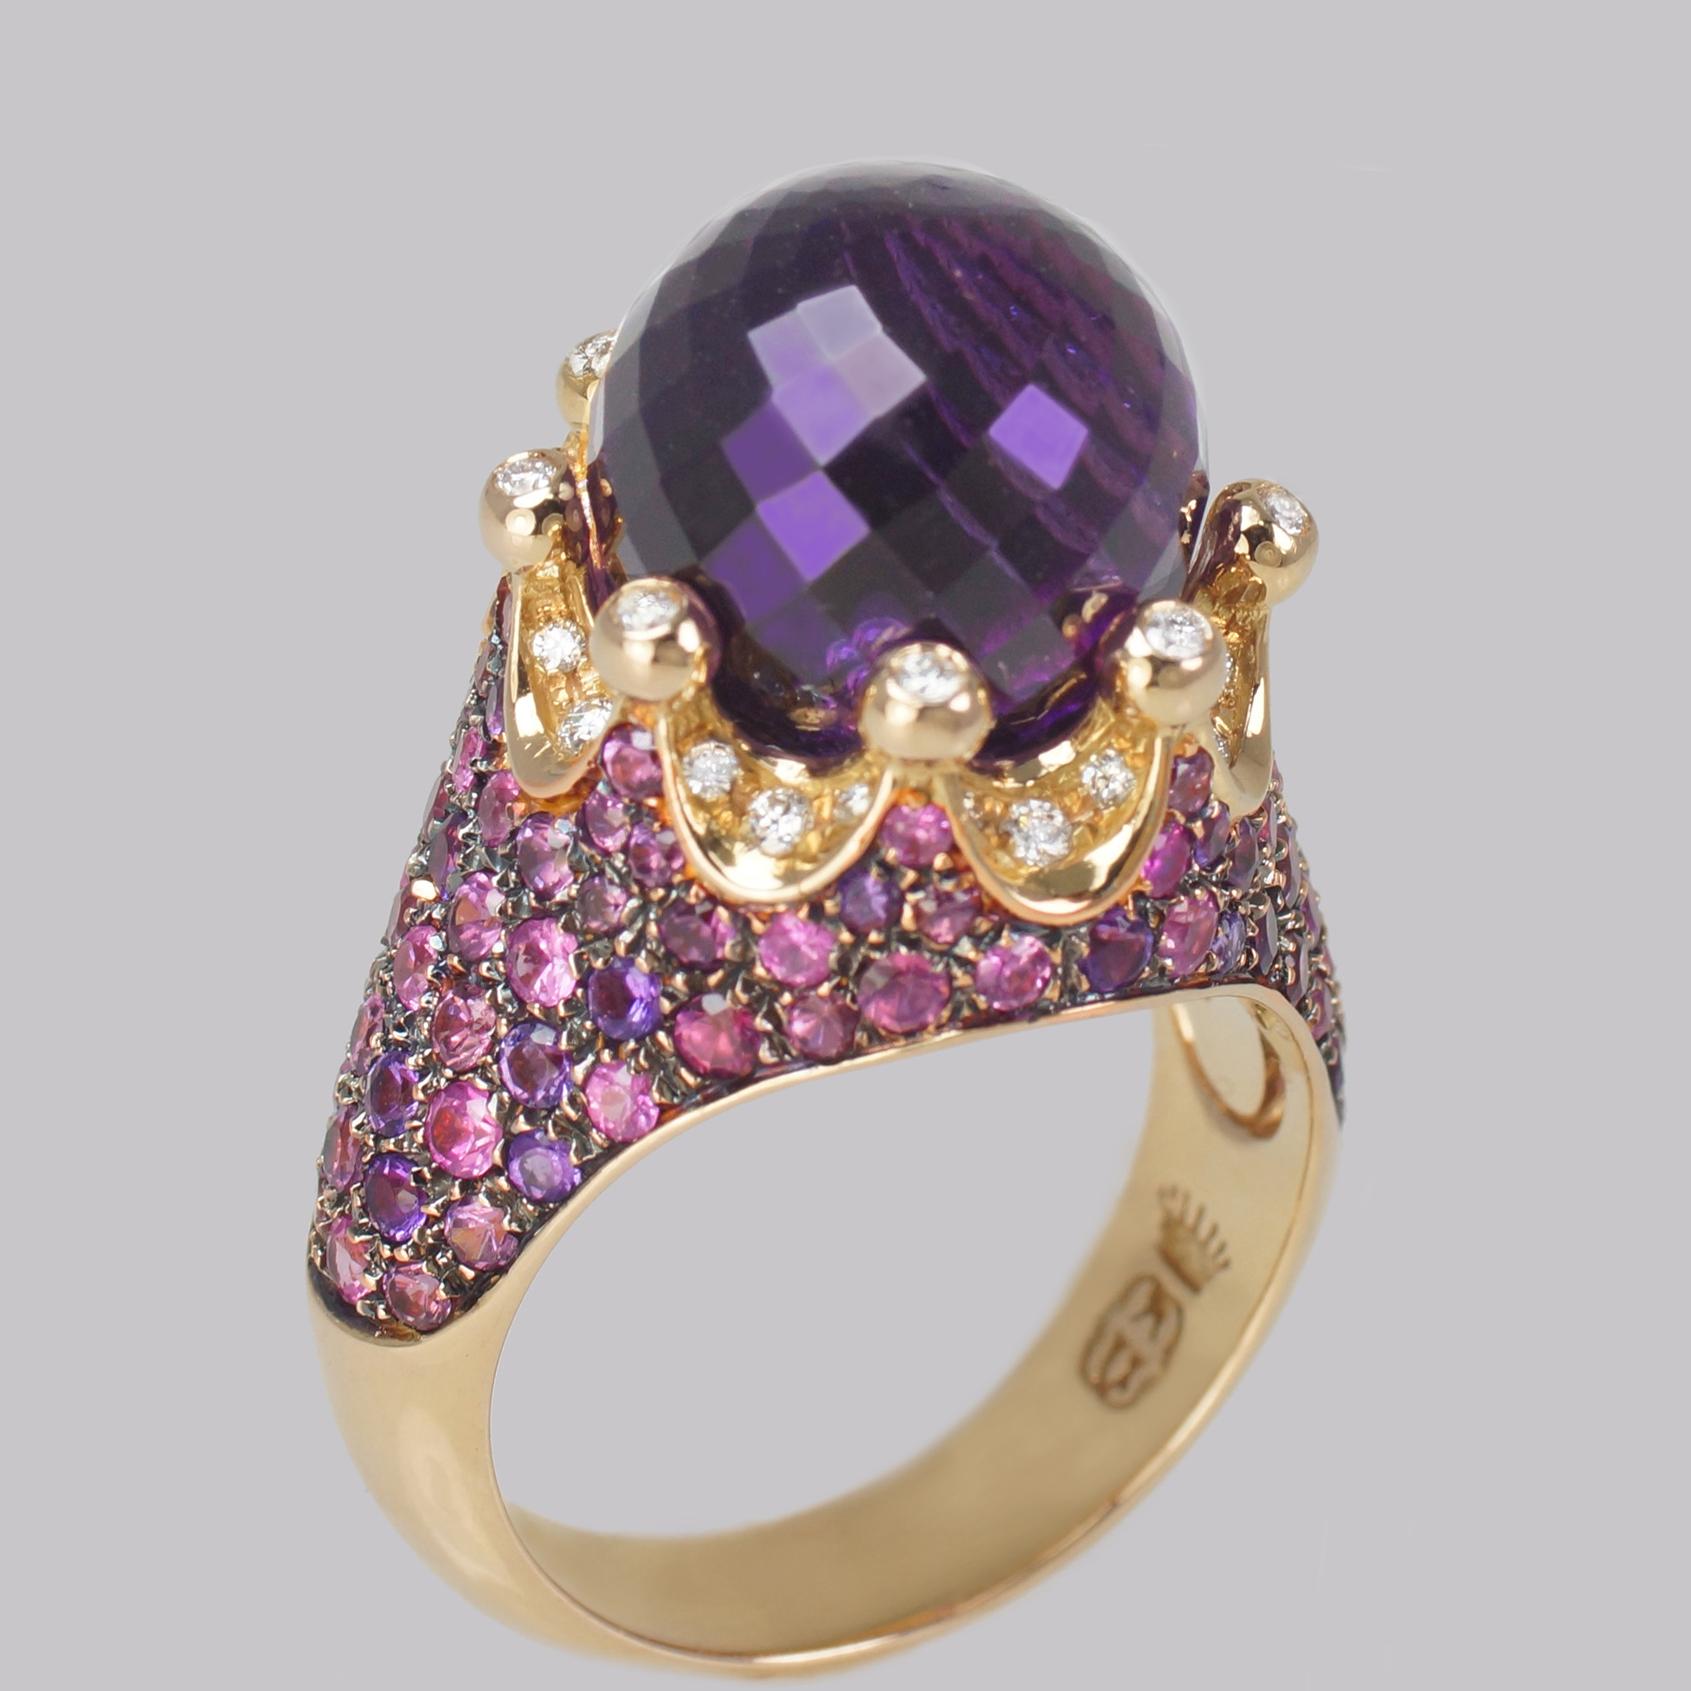 Castaldi Gioielli Amethyst Corona Ring